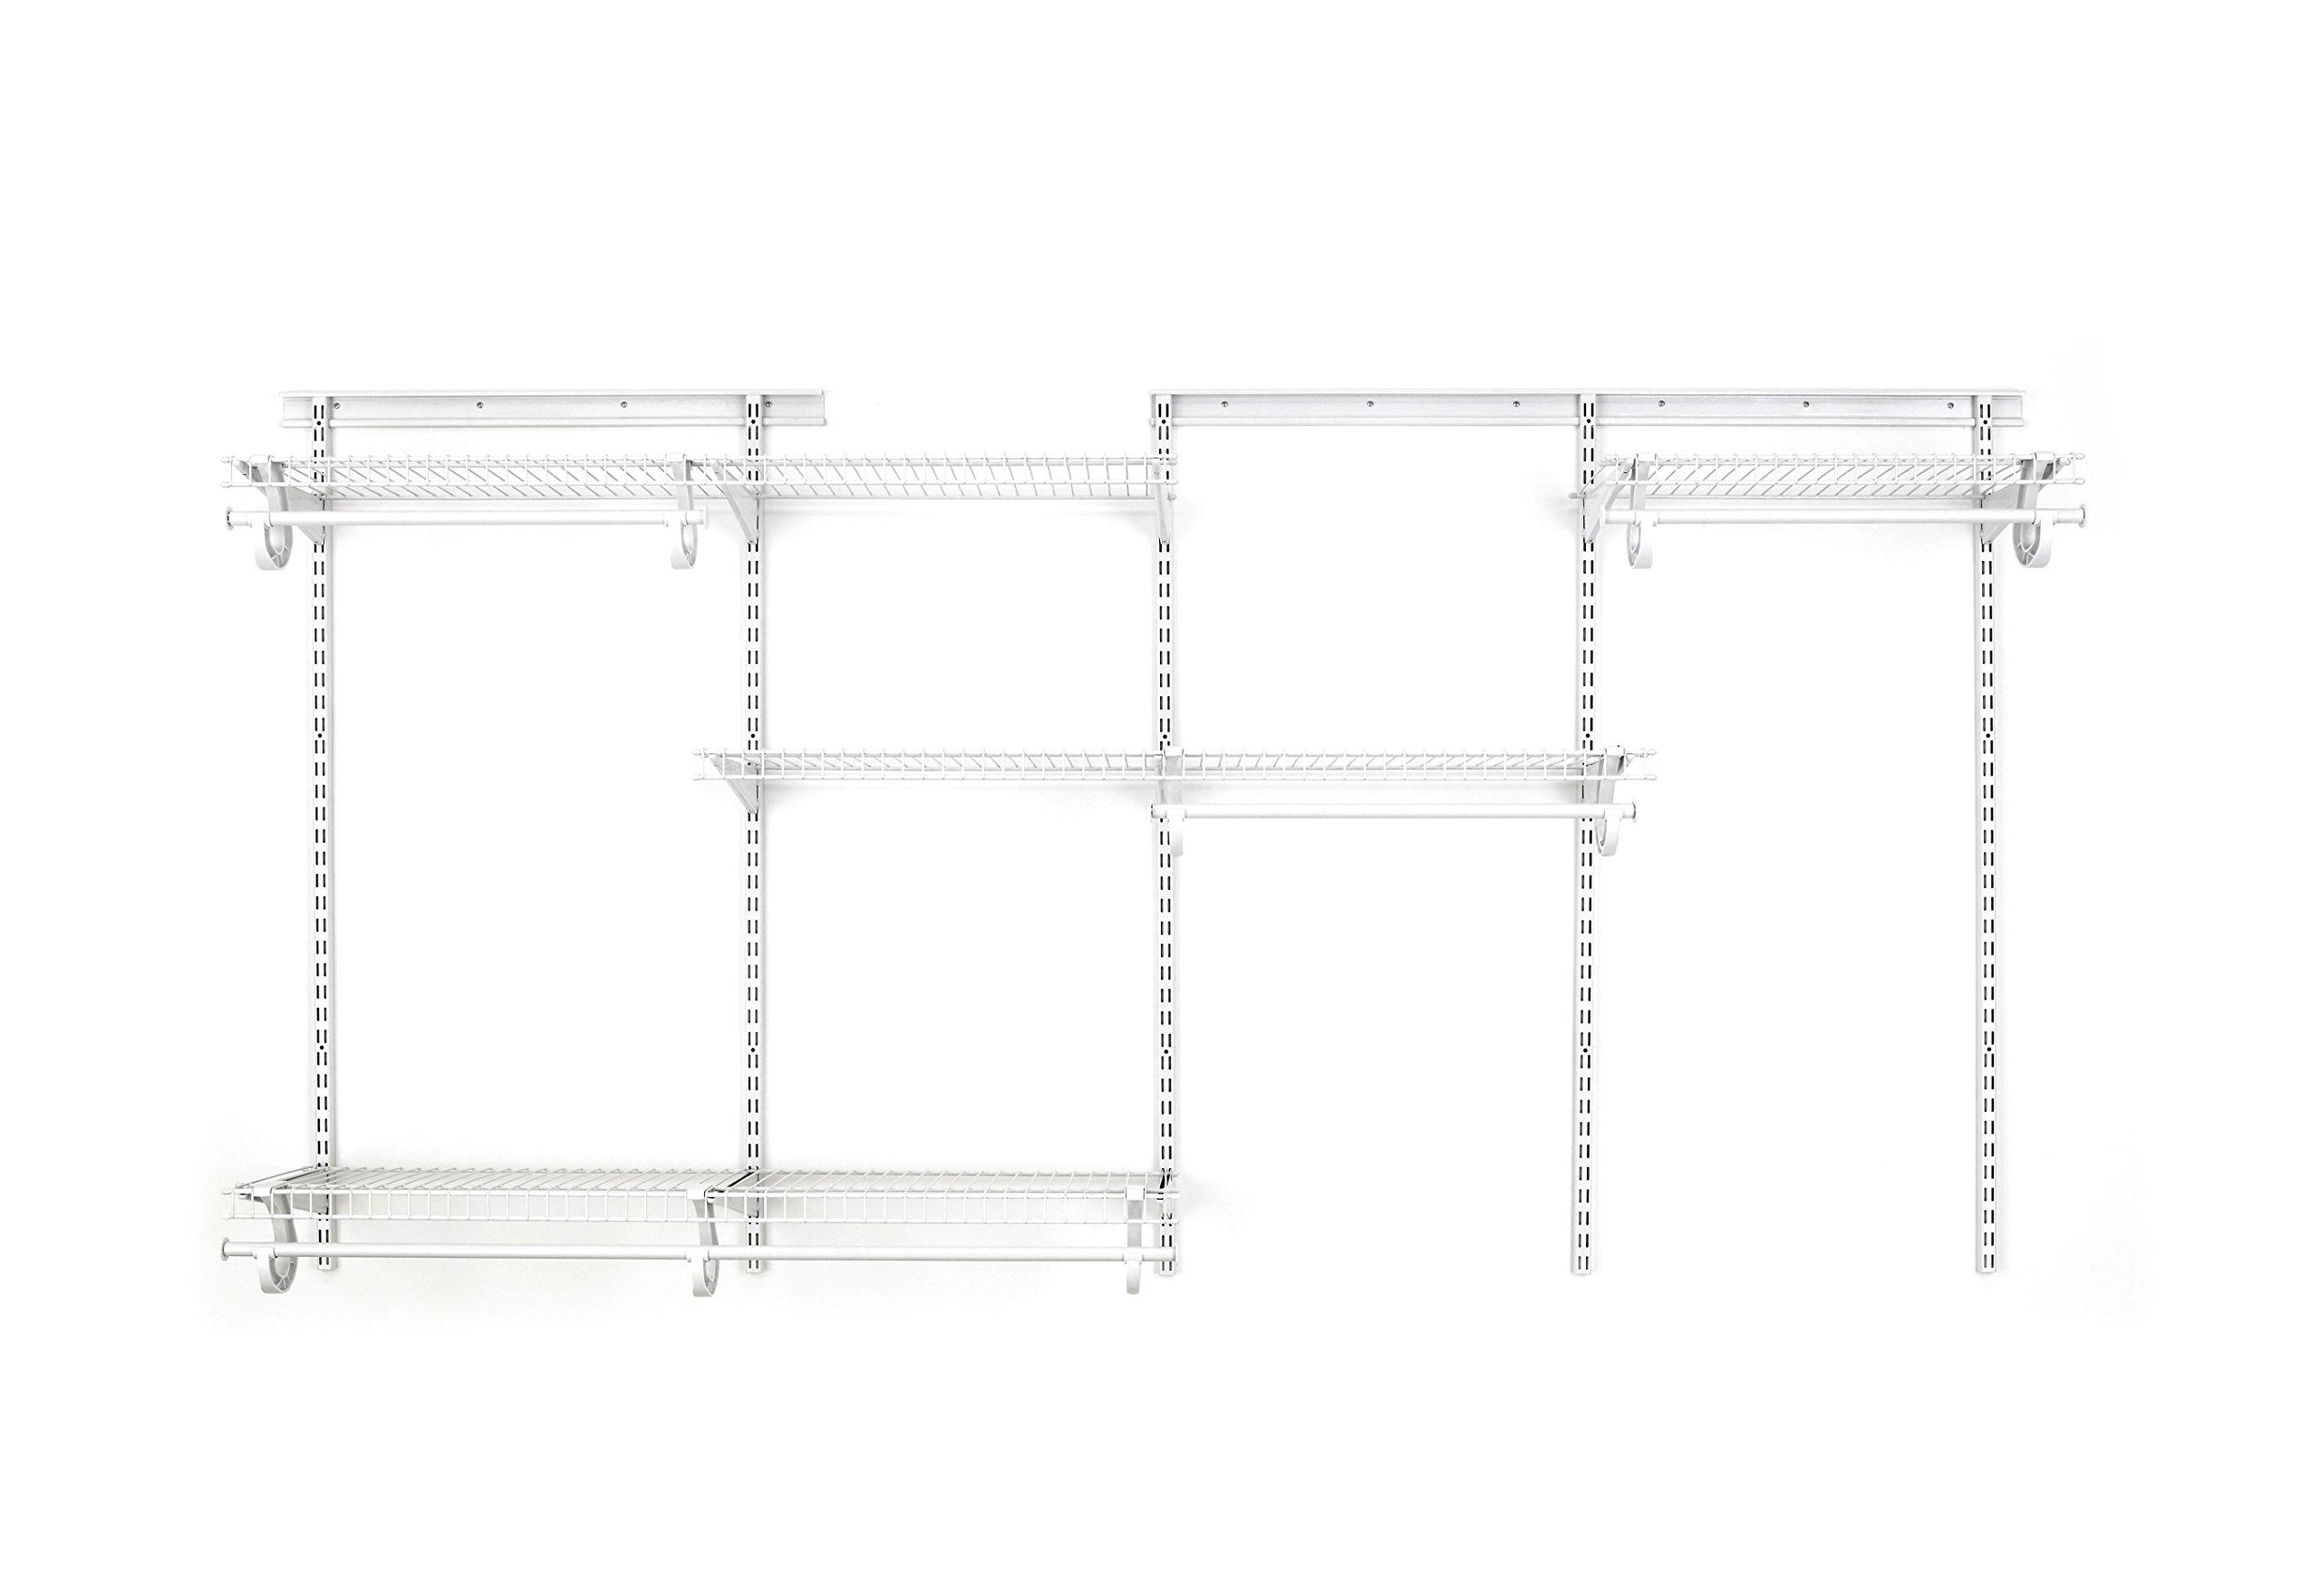 ClosetMaid 8809 ShelfTrack 5ft. to 8ft. Adjustable Closet Organizer Kit, White